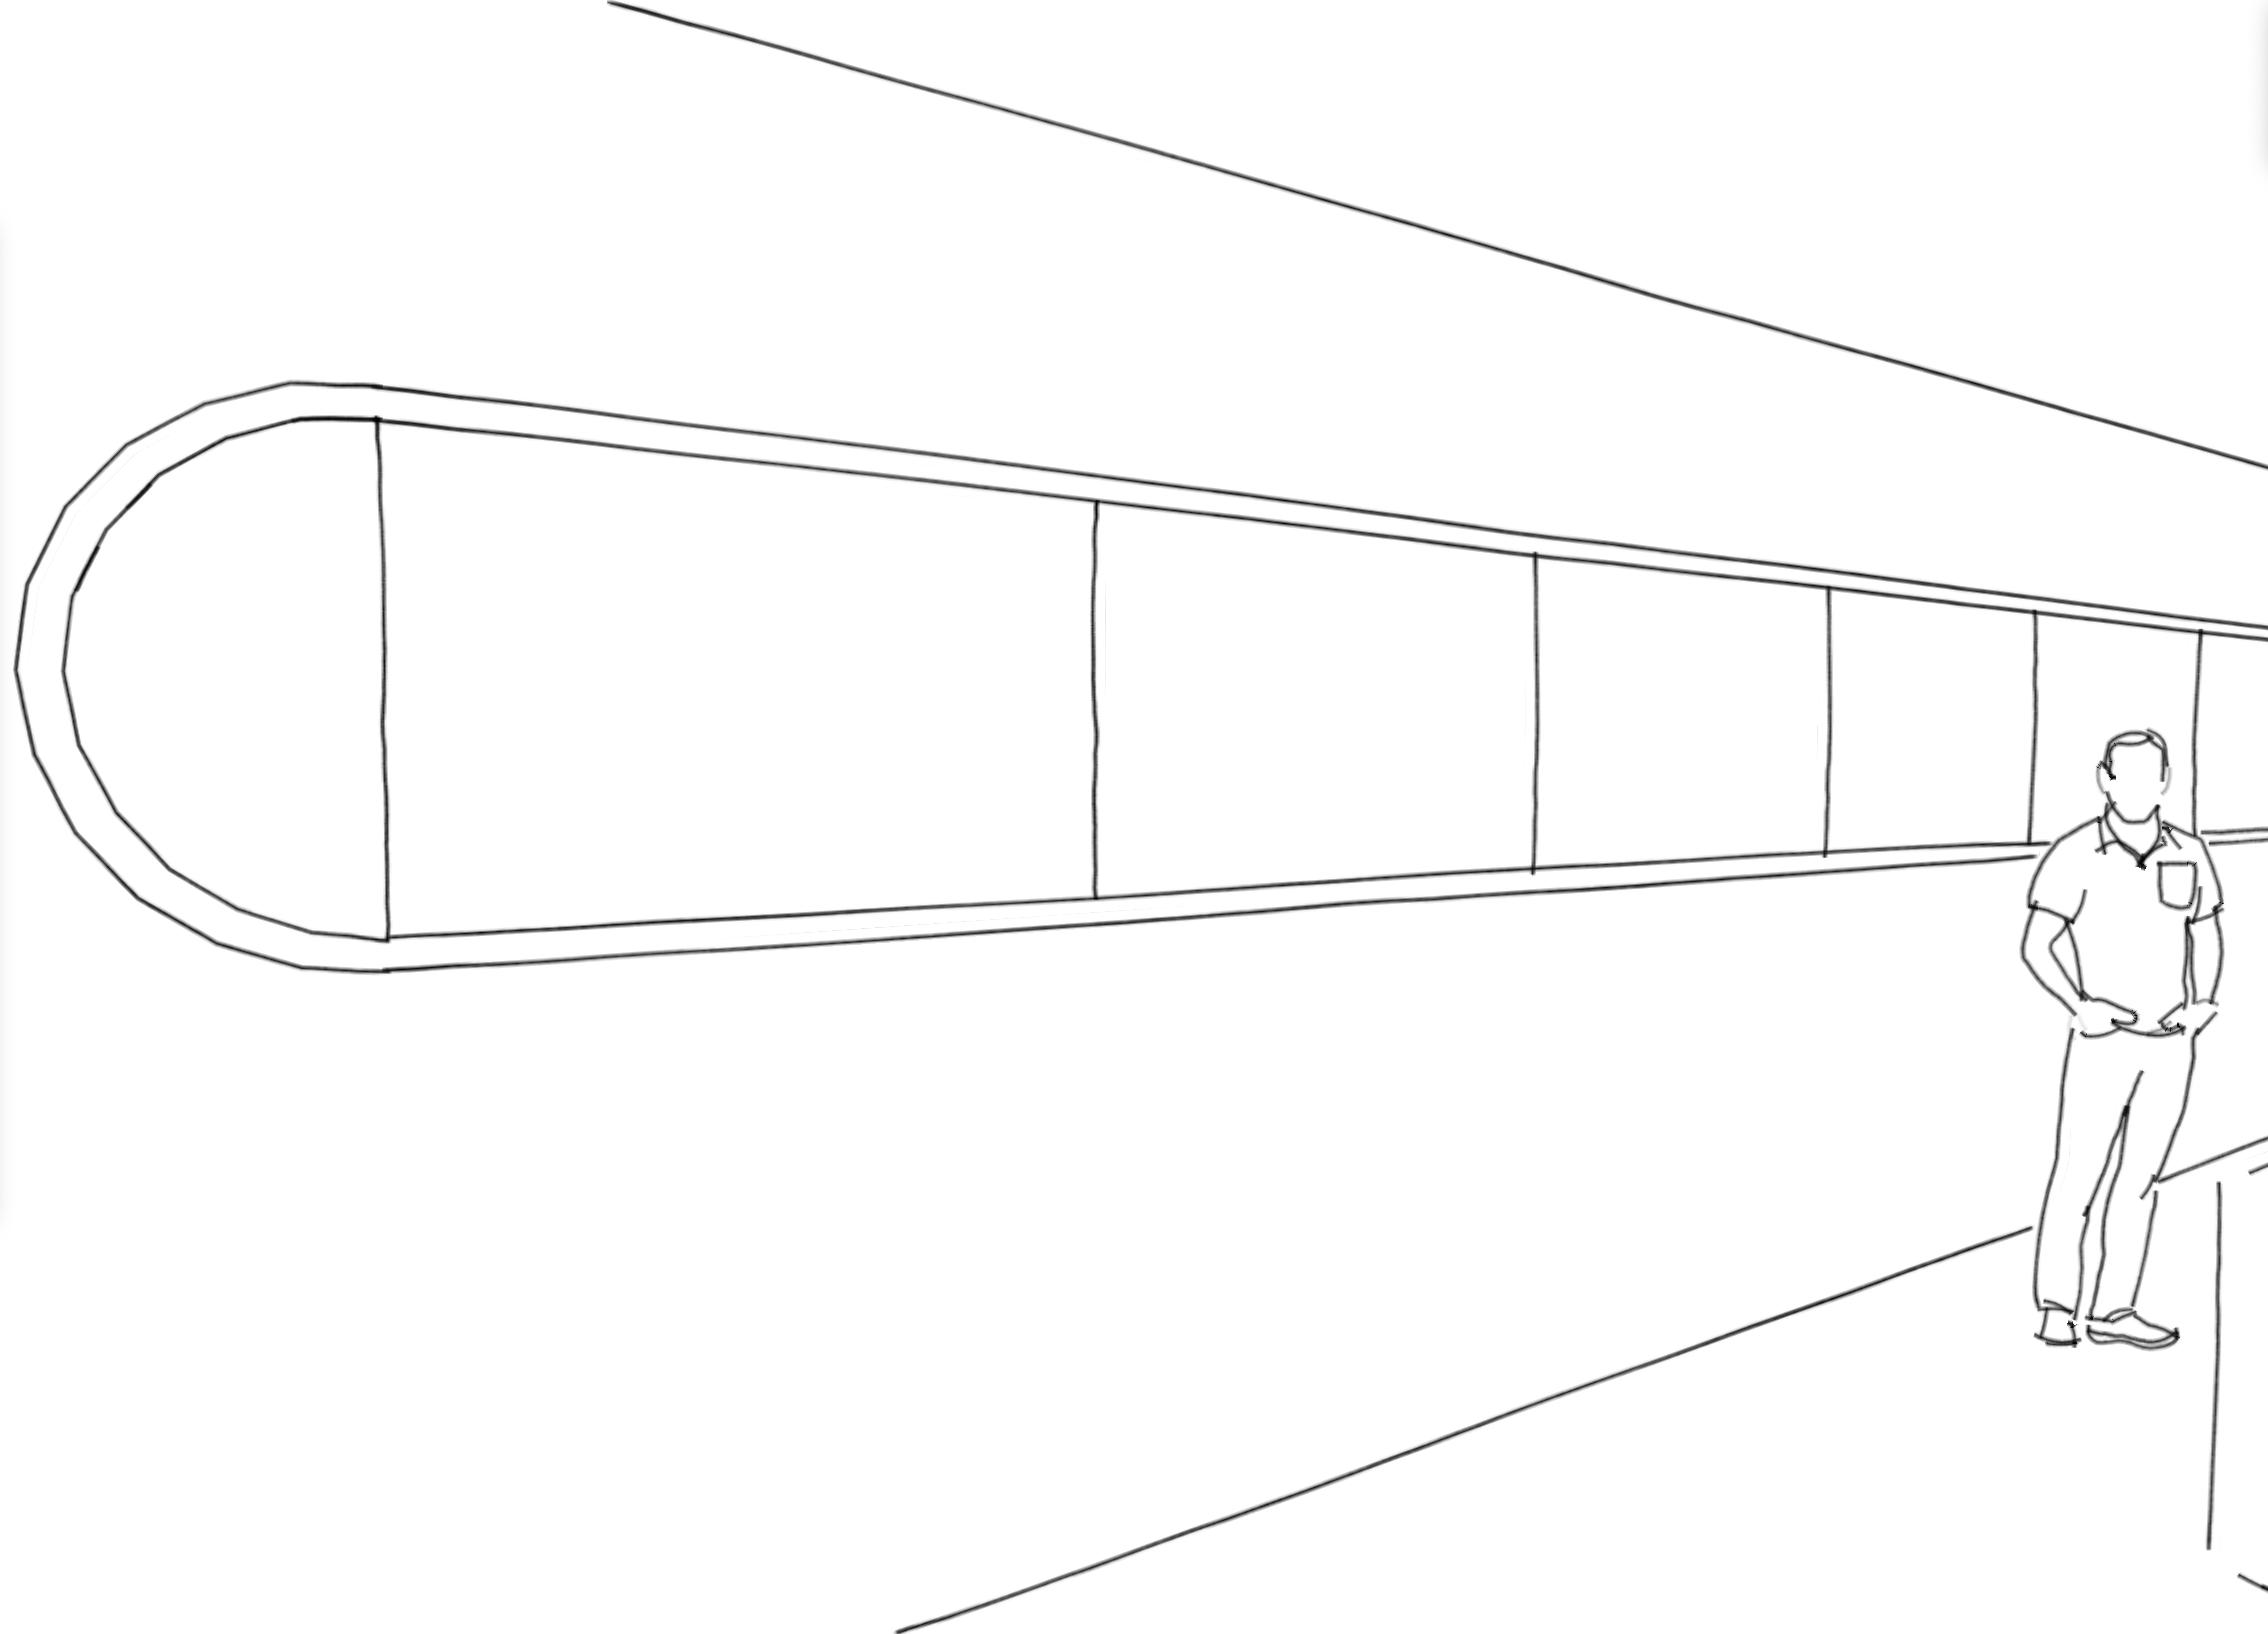 4. spaceship window